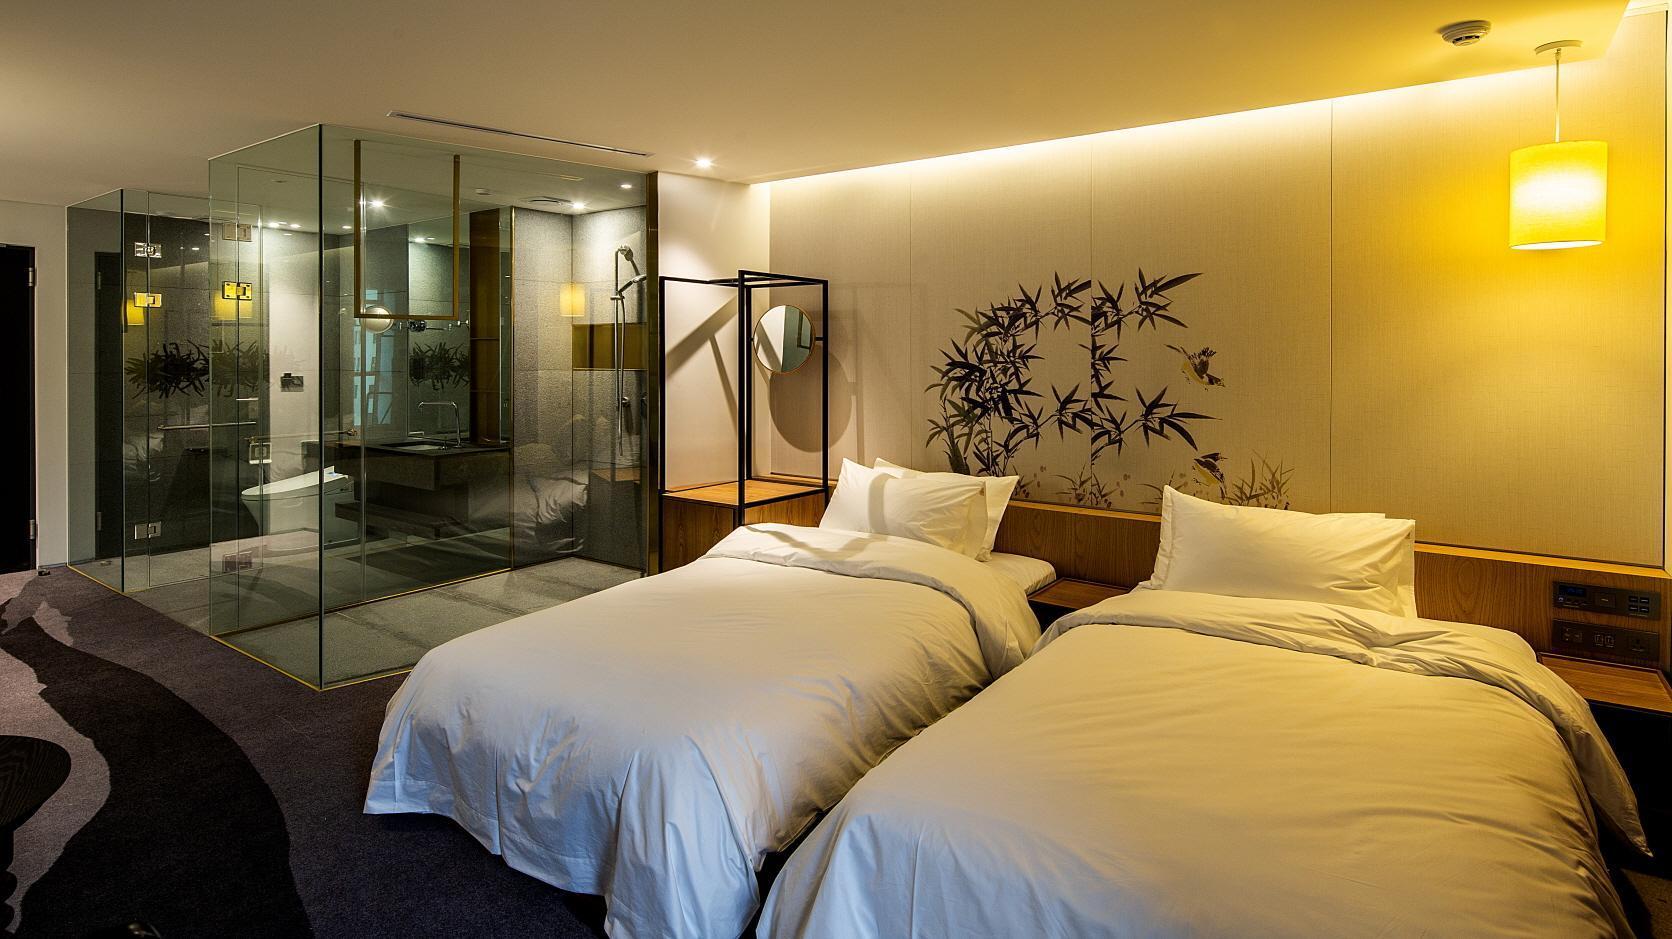 Stayrak Hotel